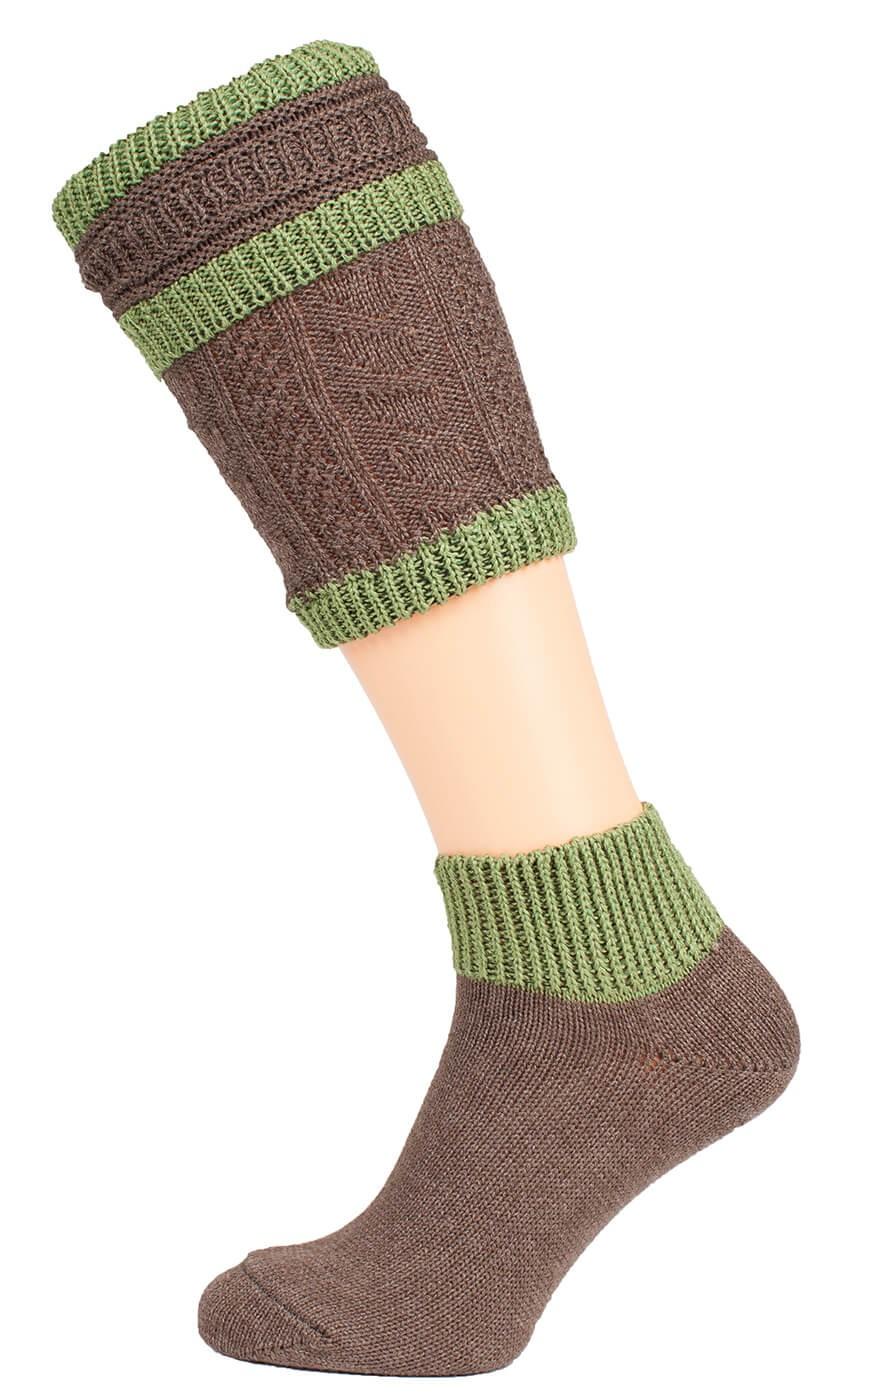 Schuhmacher Loferl set with socks CS508 brown green